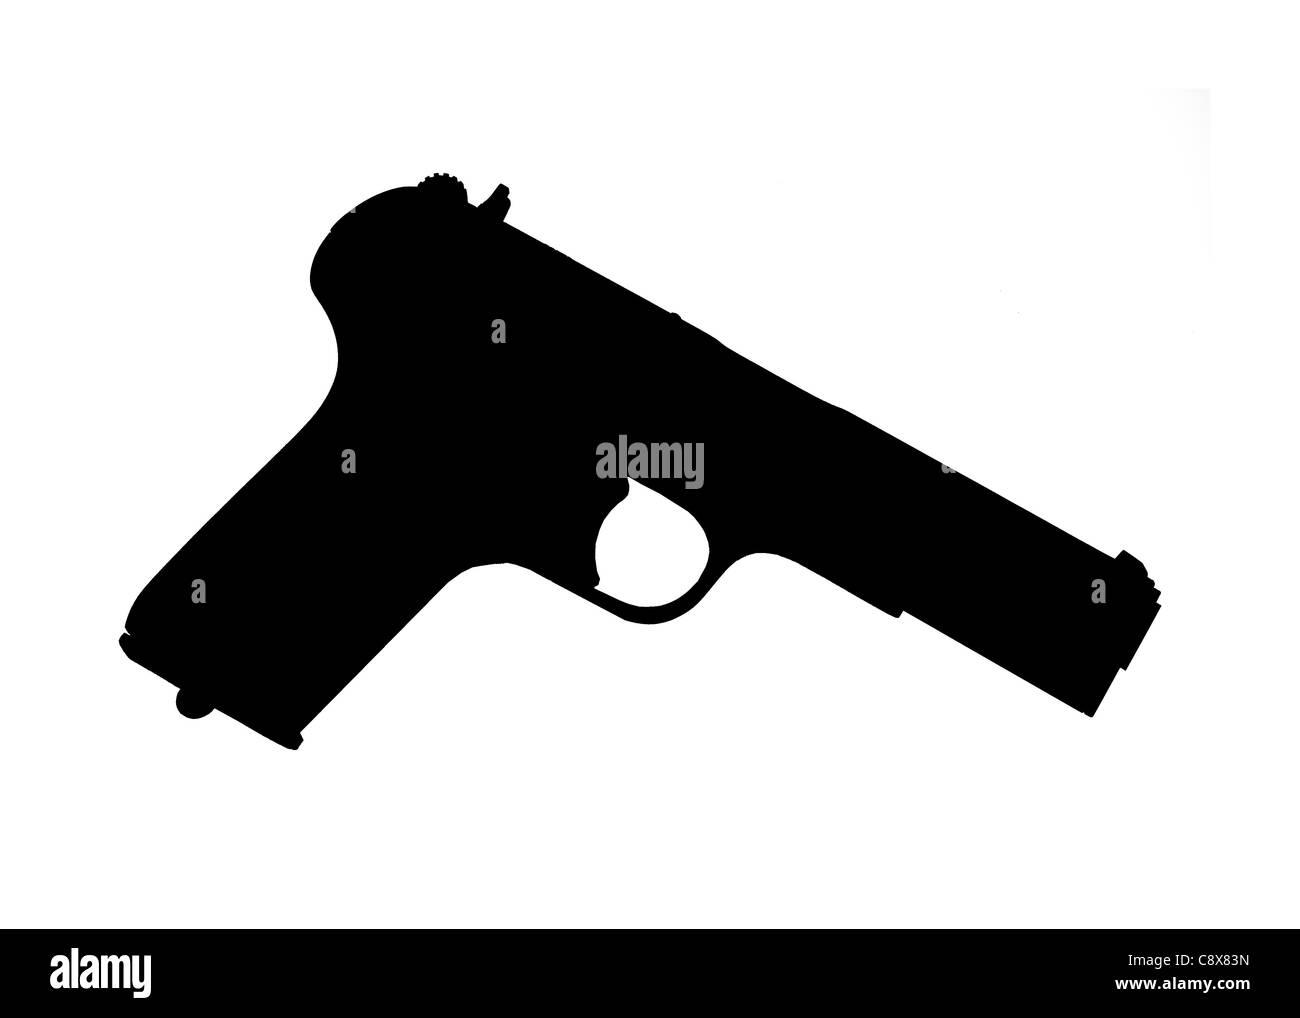 Silhouette of a handgun - Stock Image